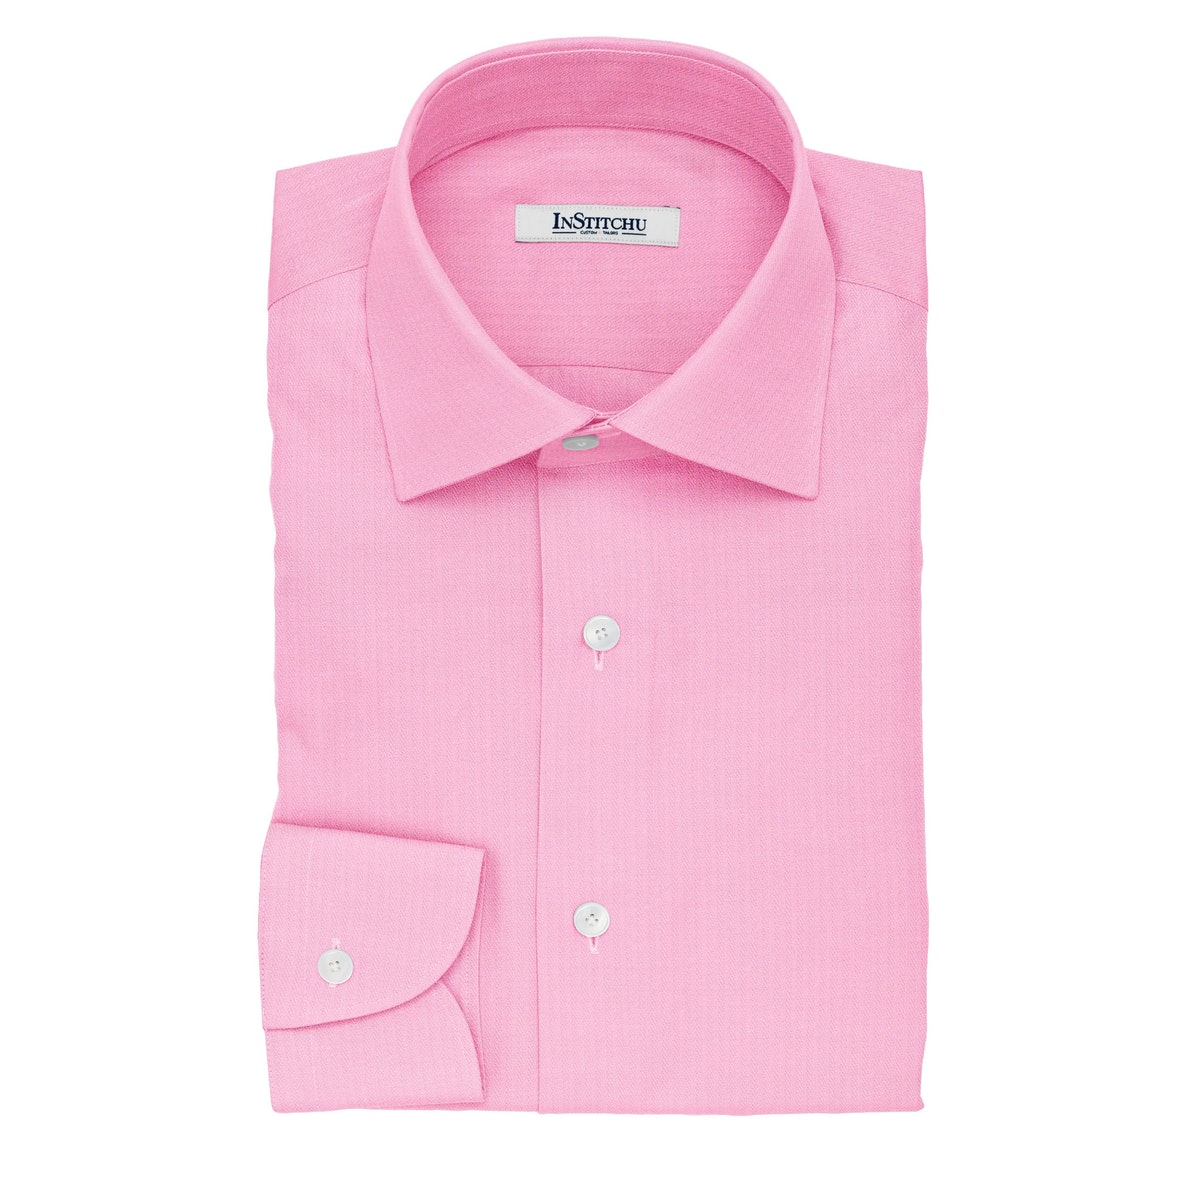 InStitchu Collection The McGonagall Pink Herringbone Cotton Shirt